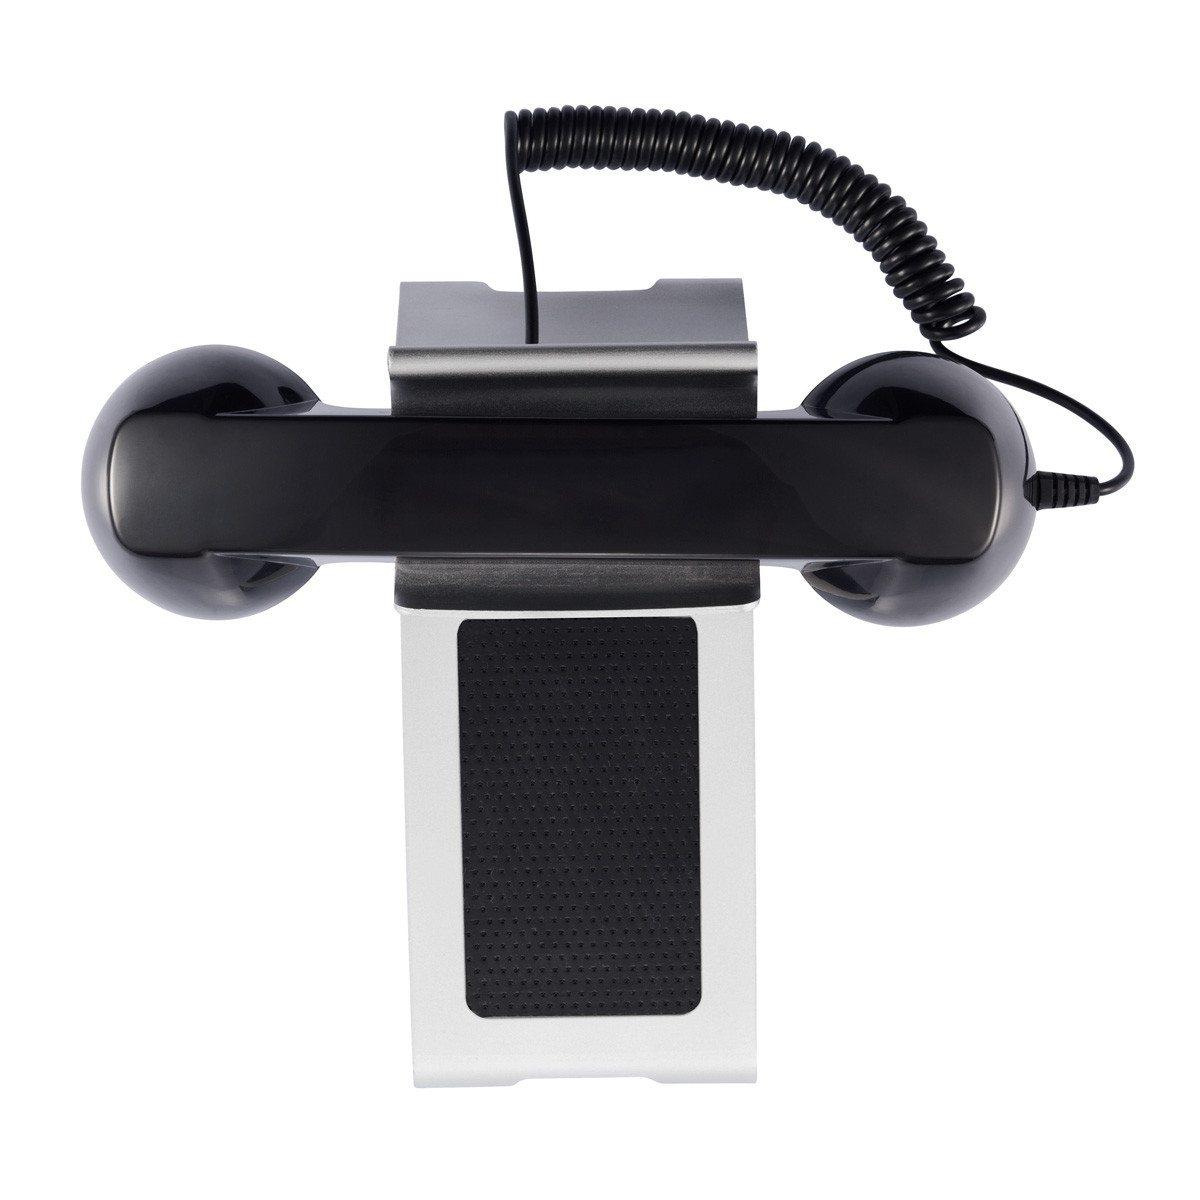 Phone Dock - Die telefon Dockingstation